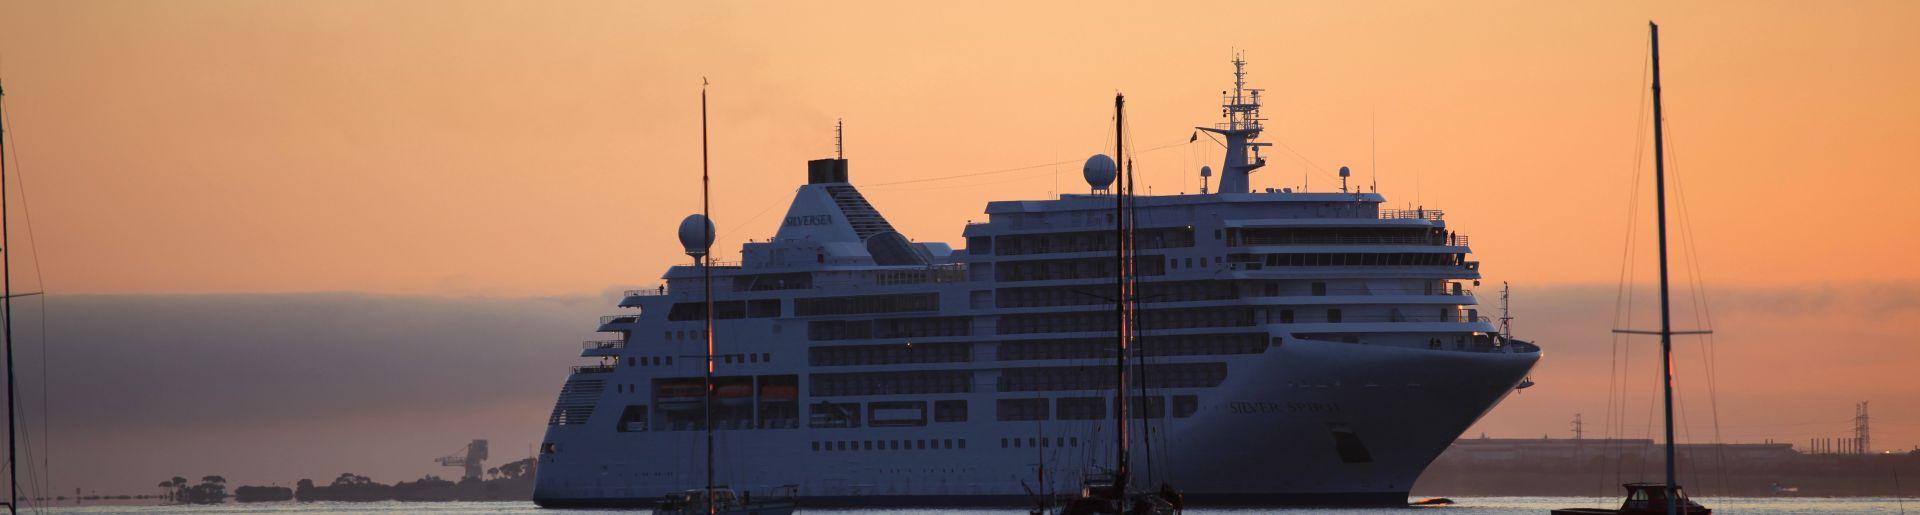 Cruiseship Shore Excursions